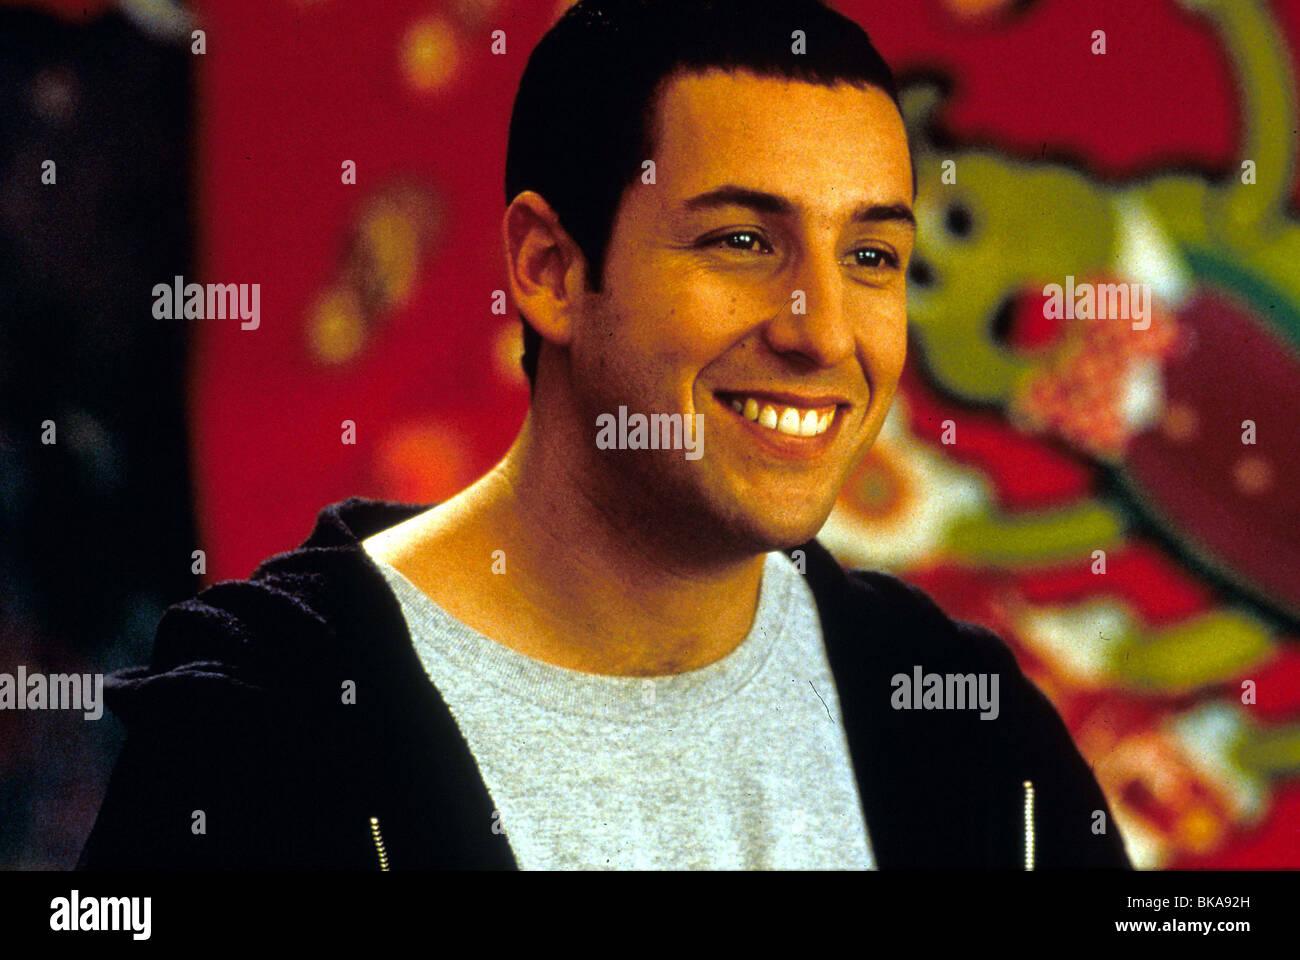 BIG DADDY -1999 ADAM SANDLER - Stock Image